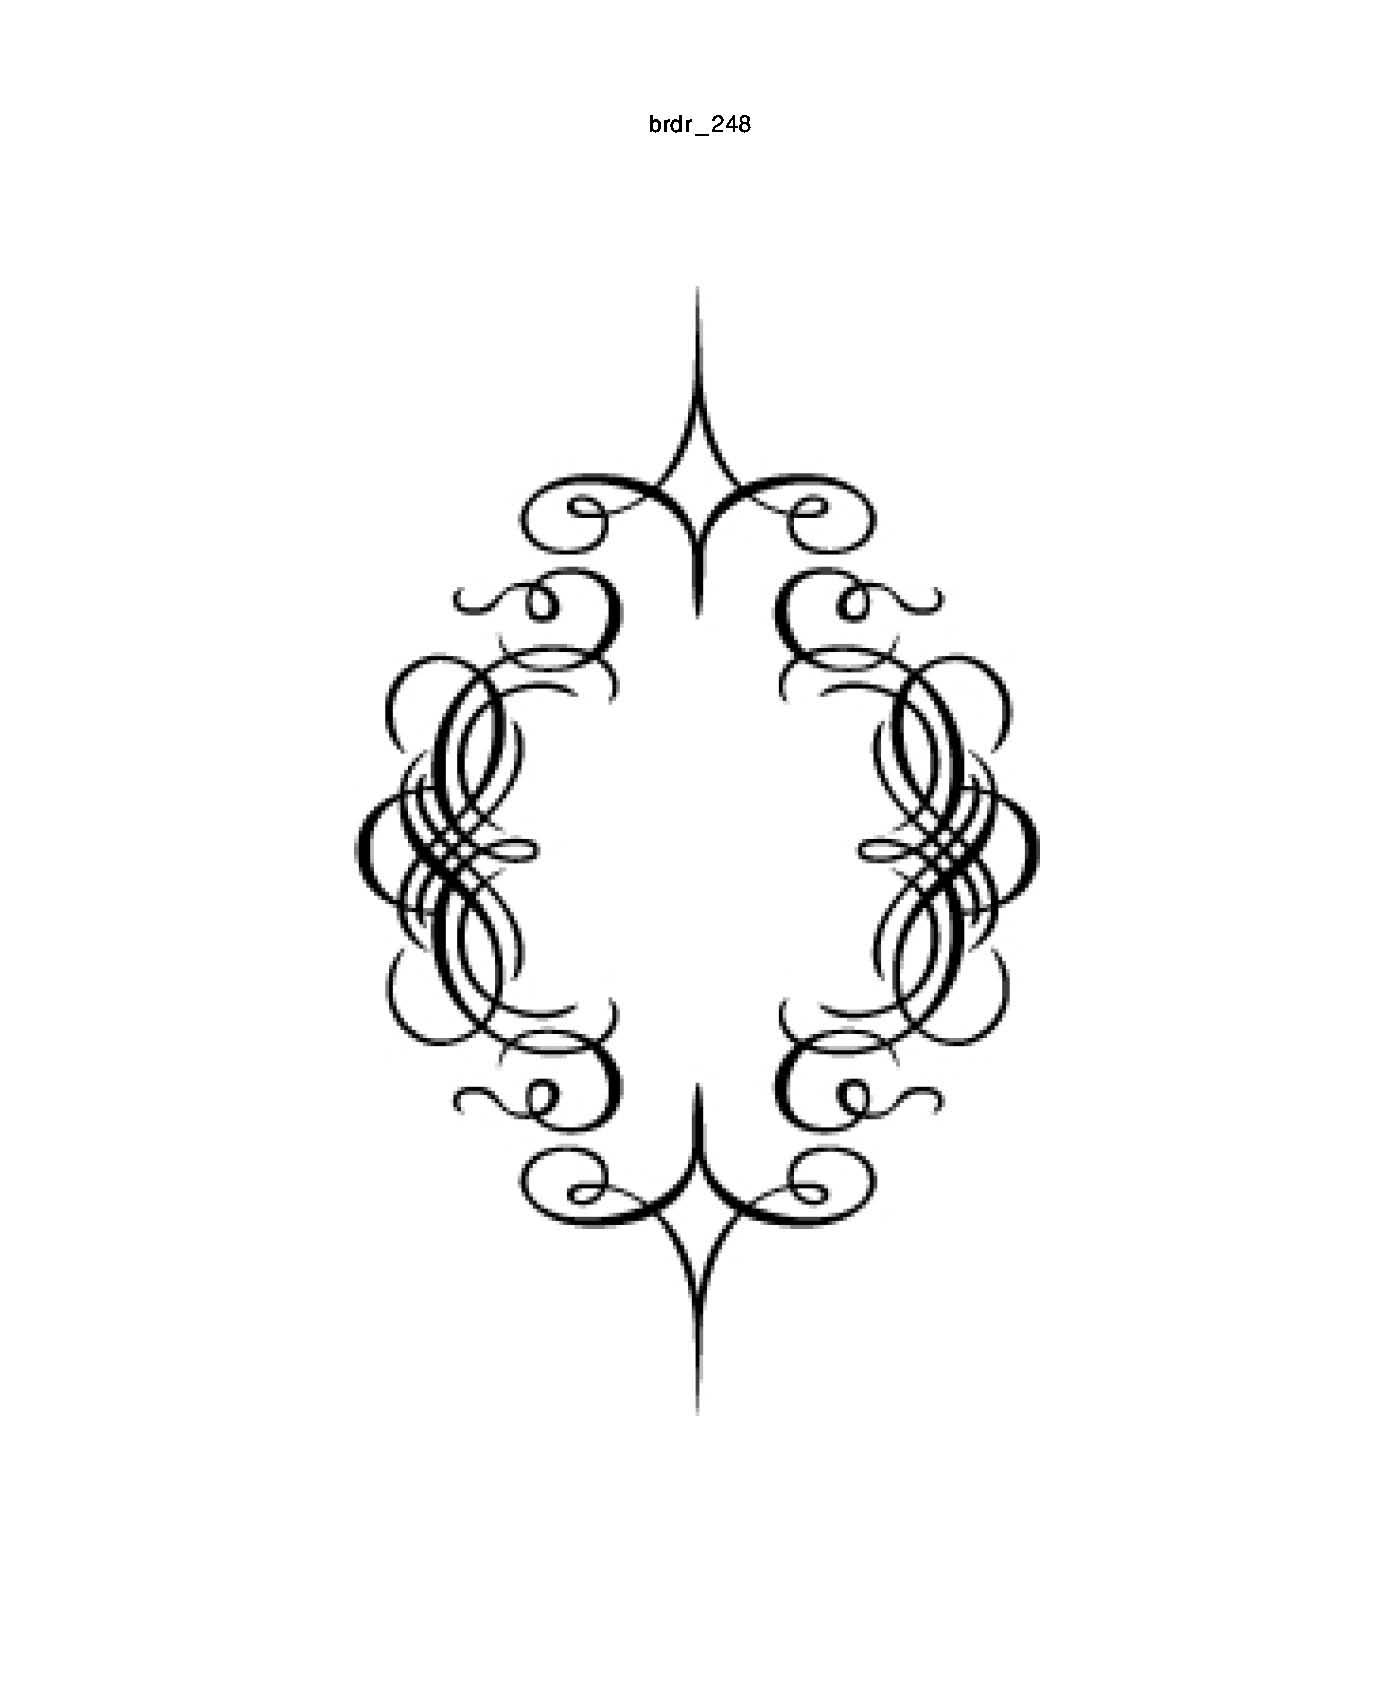 Wedding Invitation Clip Art was luxury invitation design